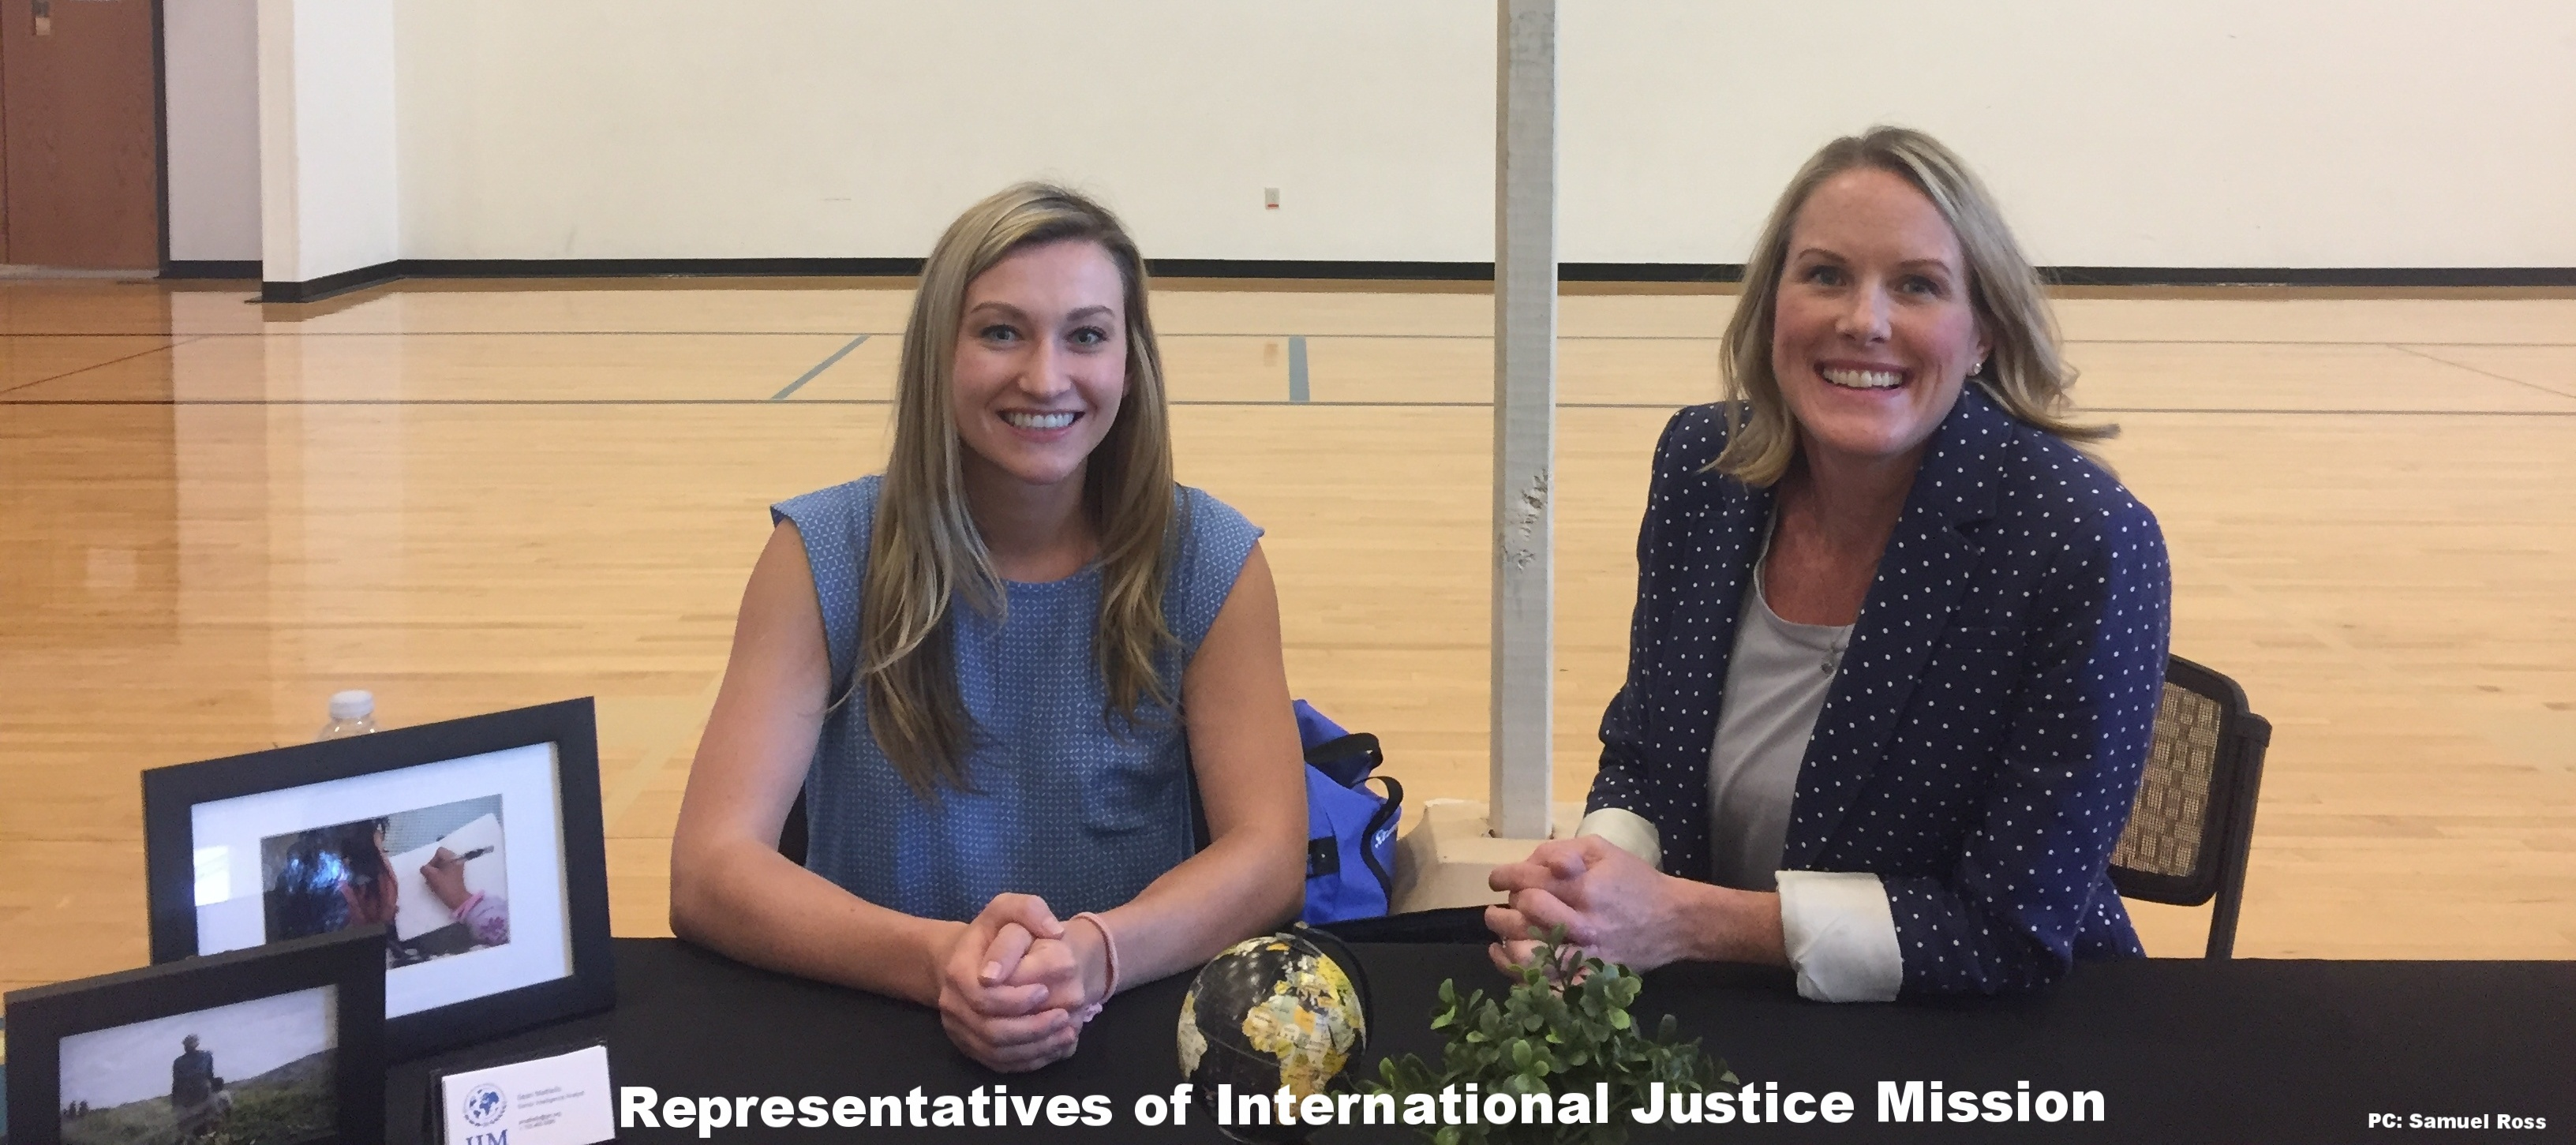 International Justice Mission representatives at the fair